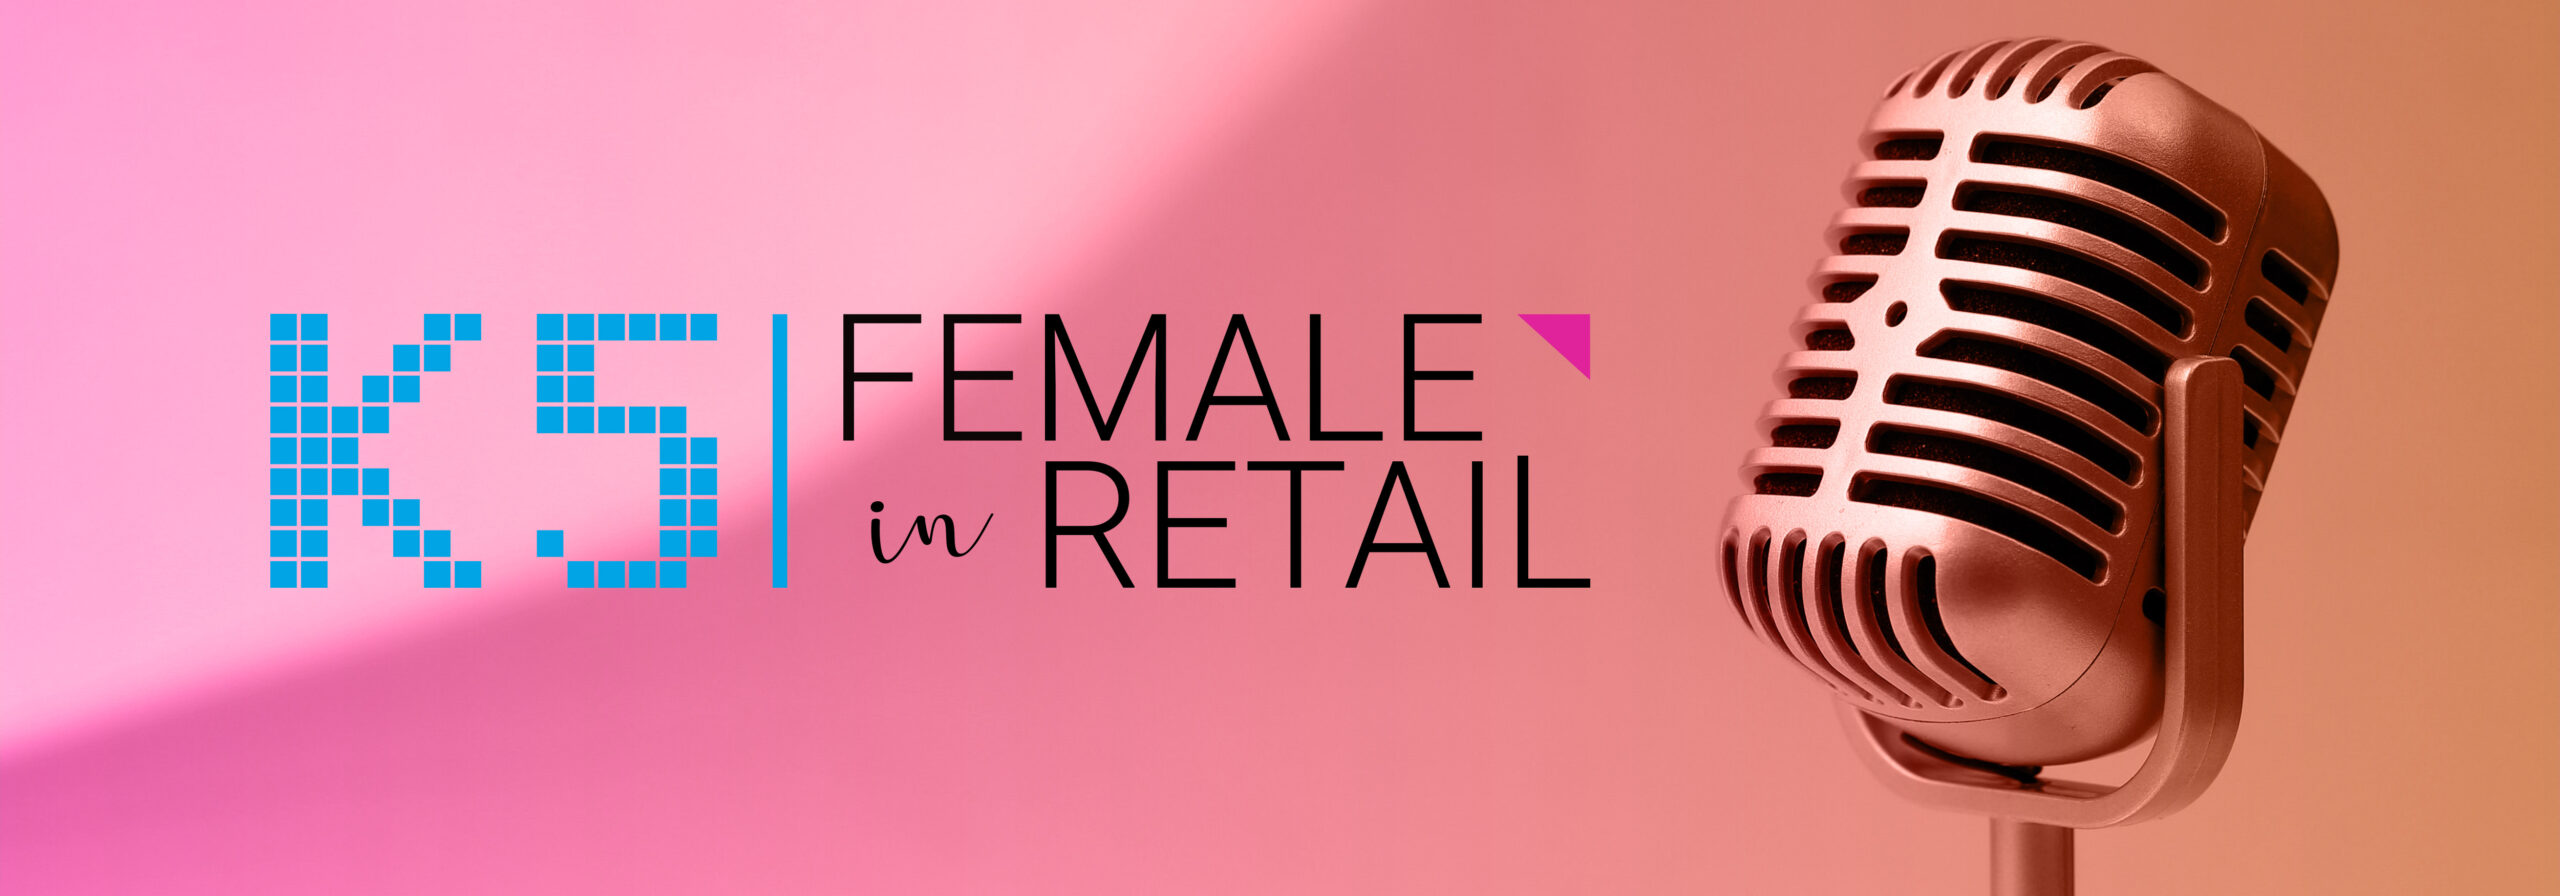 K5 Female in Retail Podcast mit Mikrofon